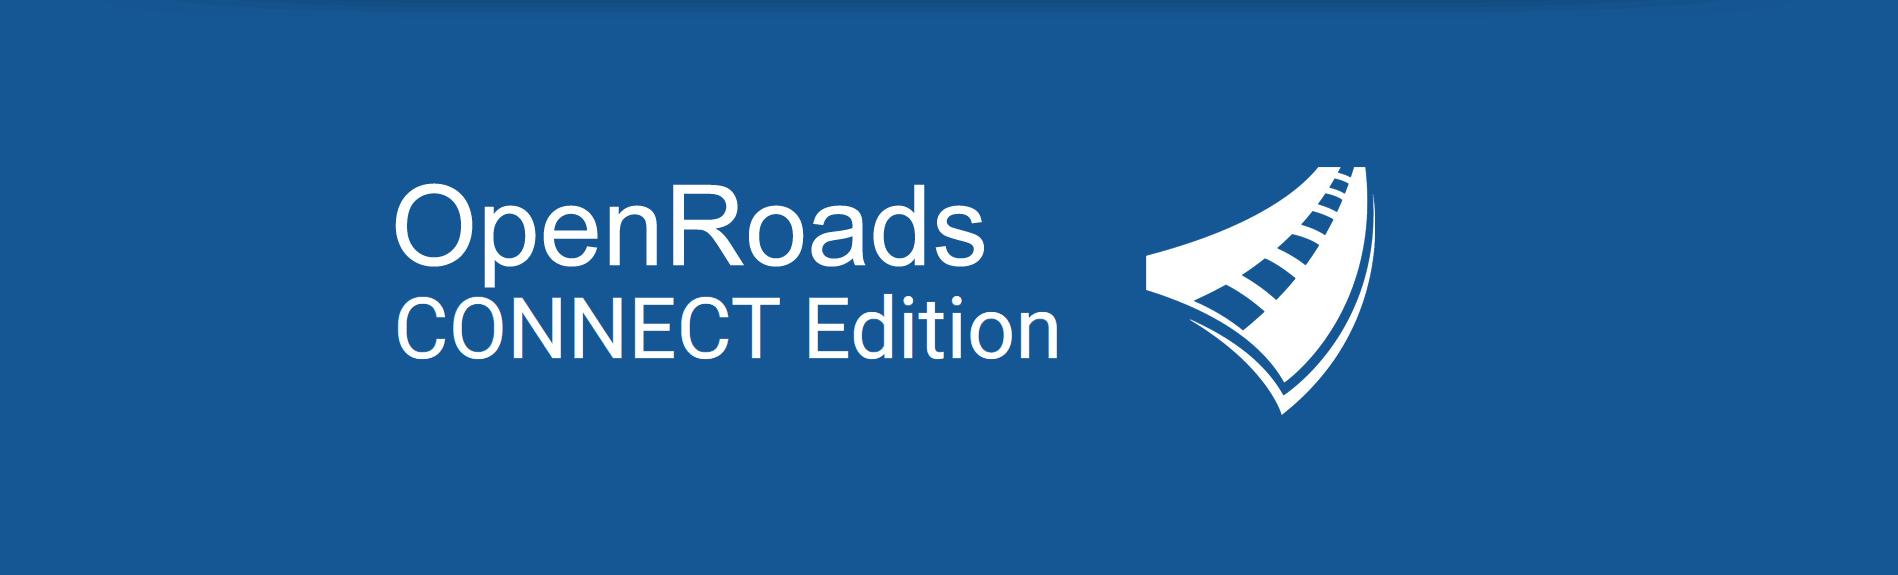 open-roads-banner